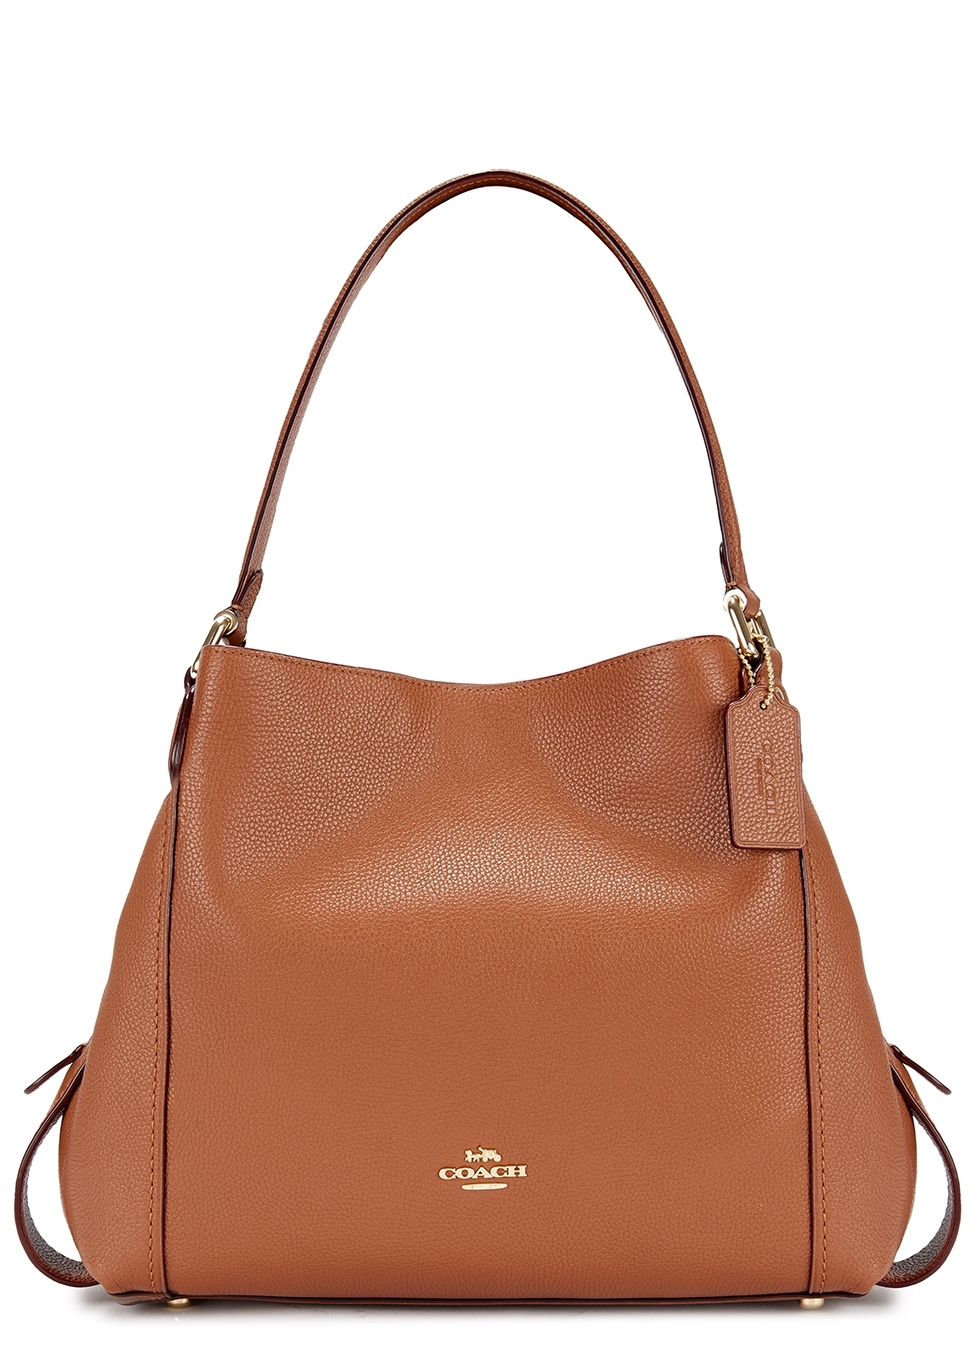 Coach - Designer Bags 5424dacb1a104